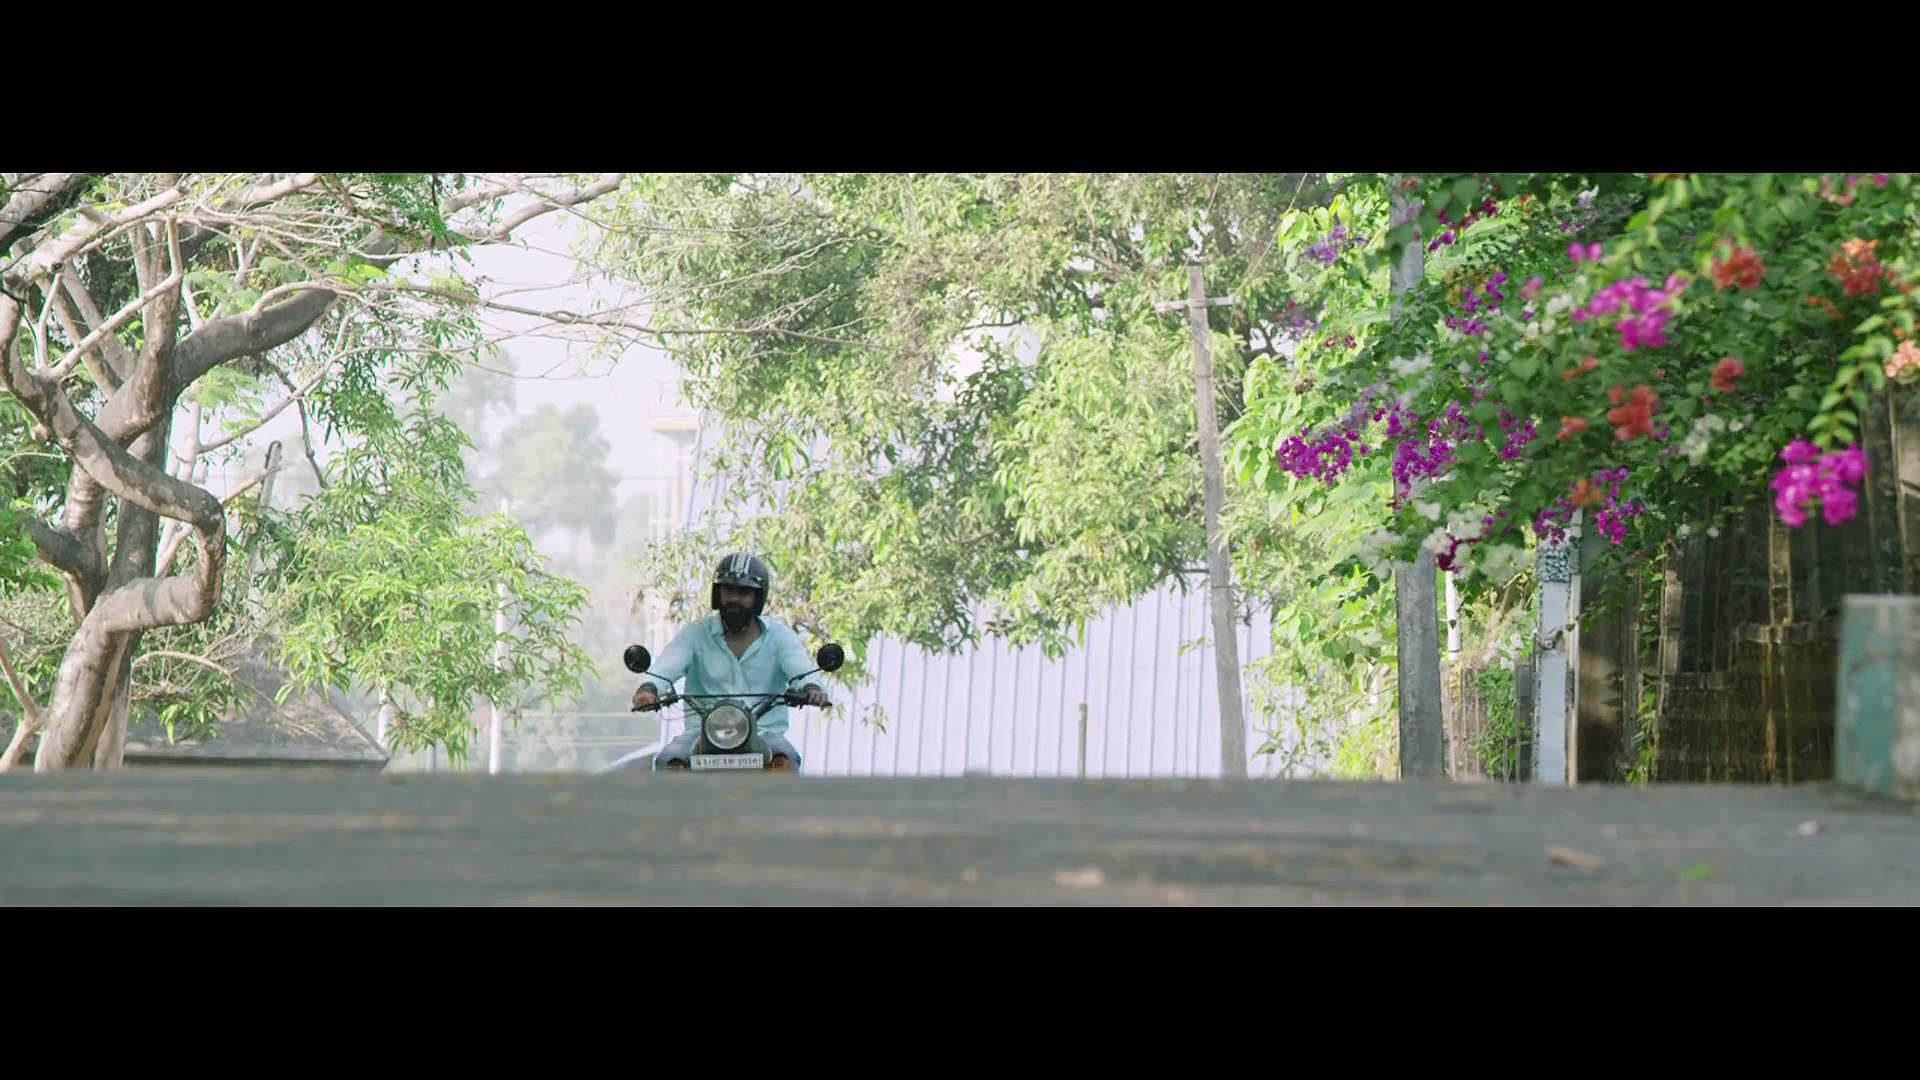 Pathiye Novai song from - 32am Adhyayam 23am Vakyam - Malayalam Movie (2015) starring Govind Padmaso